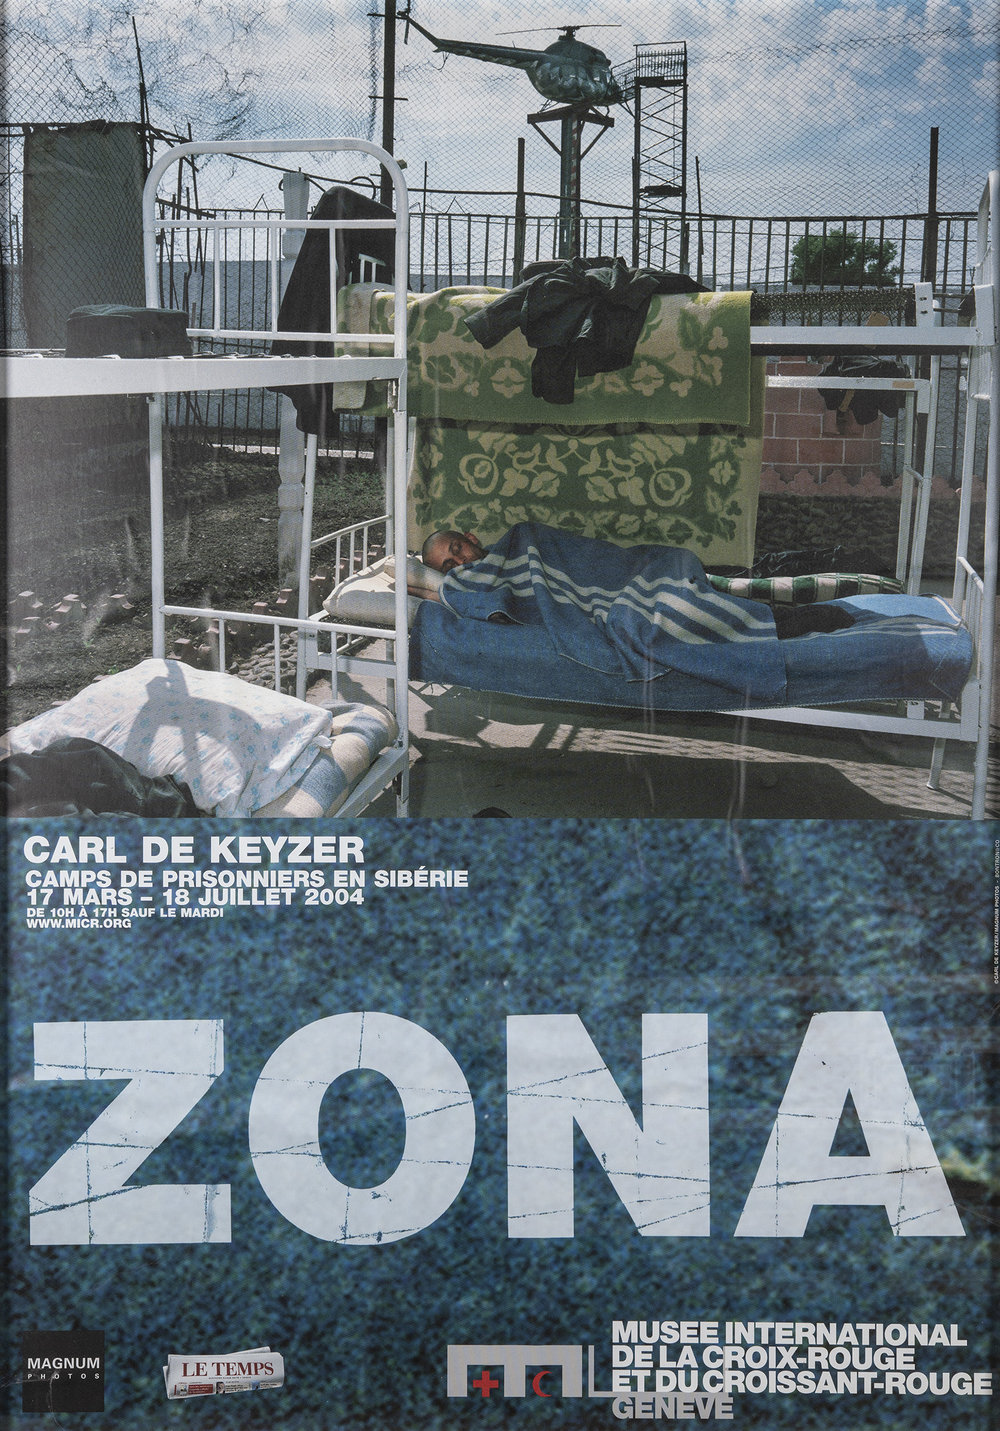 2004 Zona Red cross.jpg